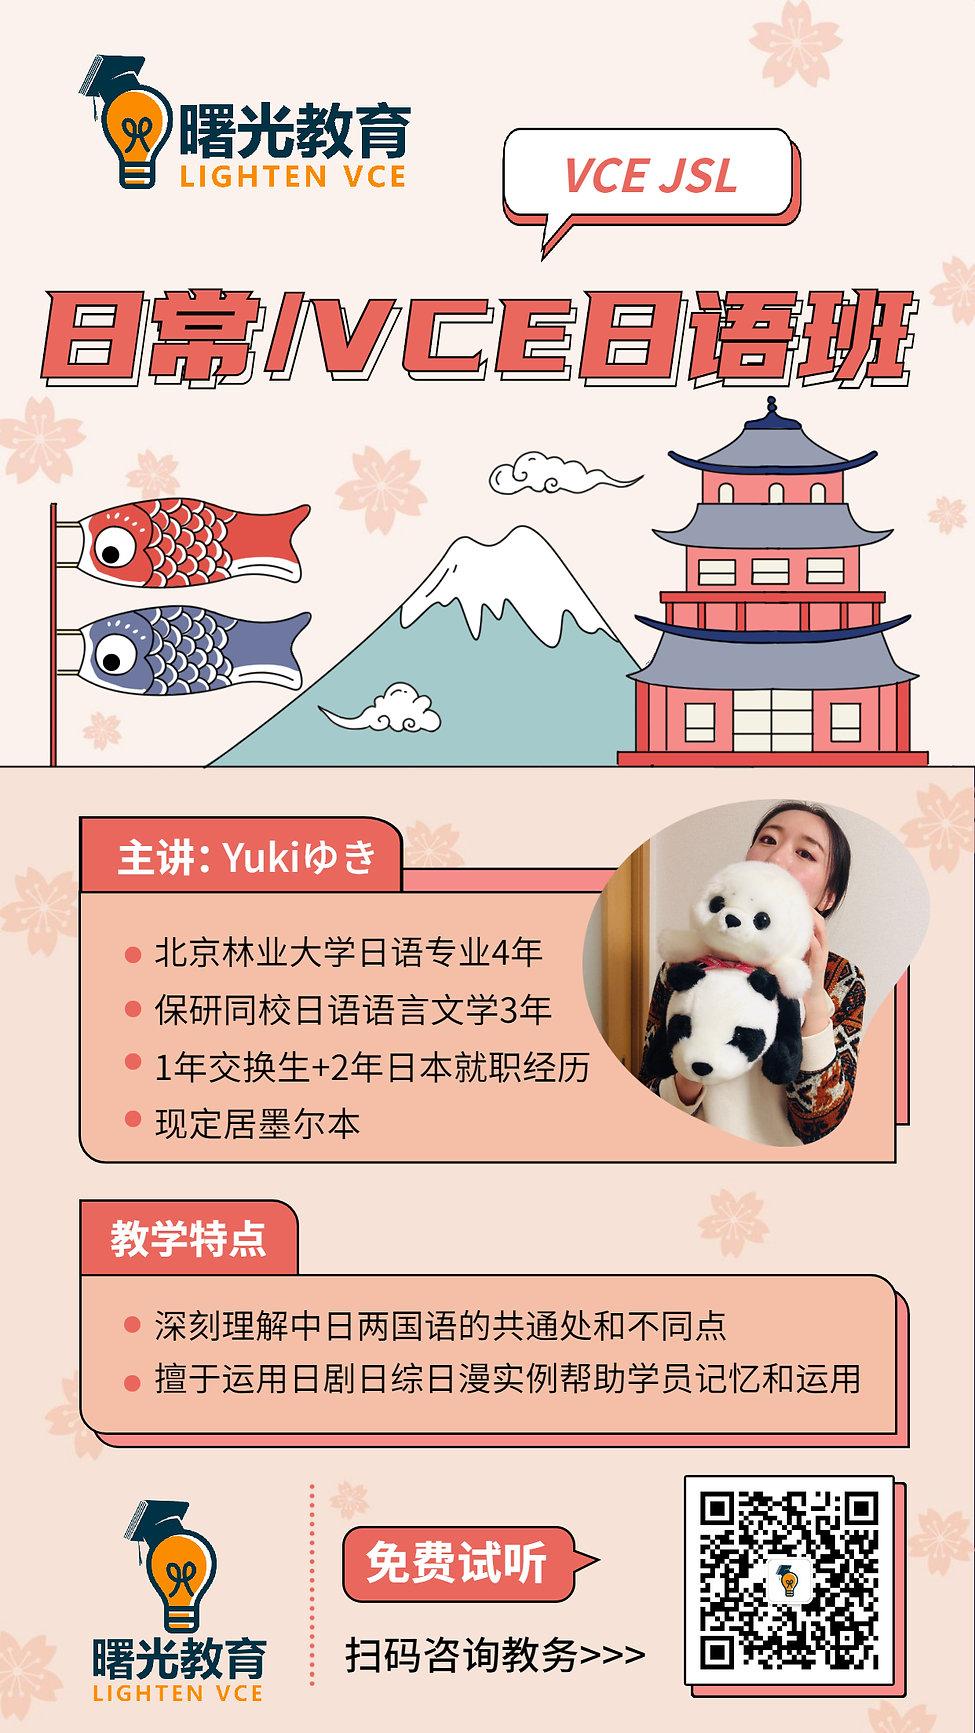 VCE日语海报.jpg